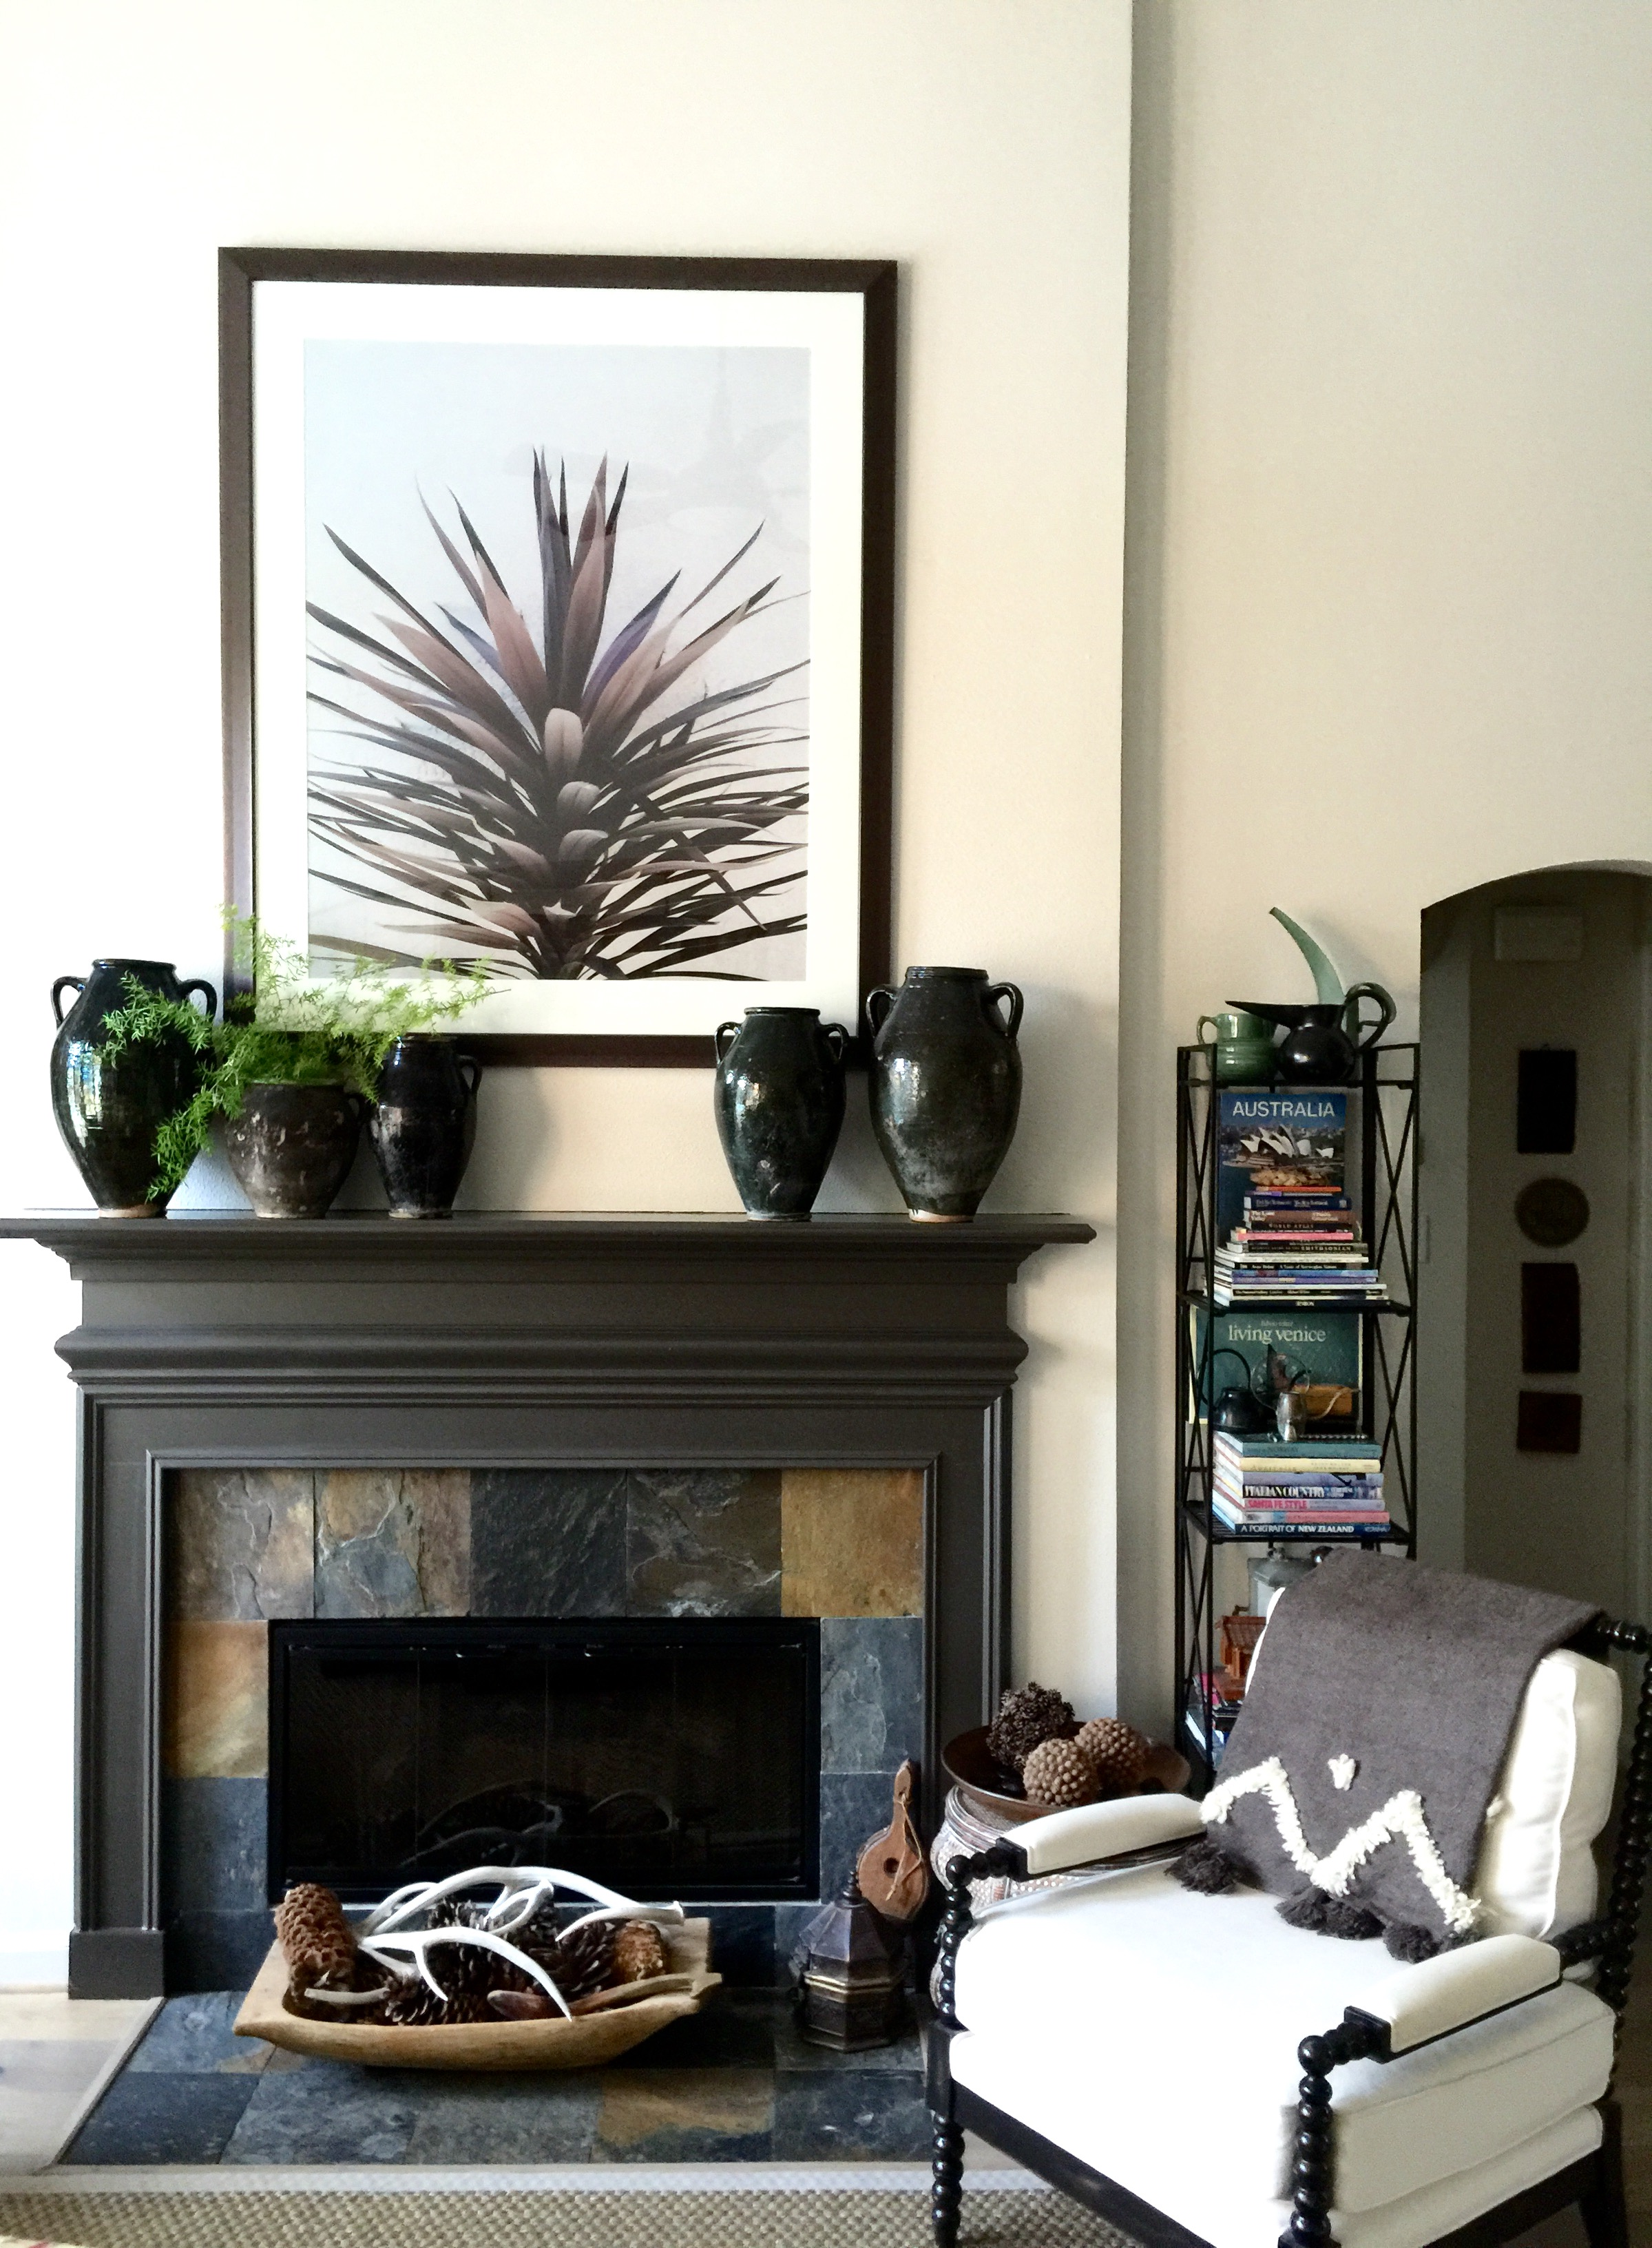 Overall Fireplace - Photography as art over fireplace, Tori Aston, Photographer.